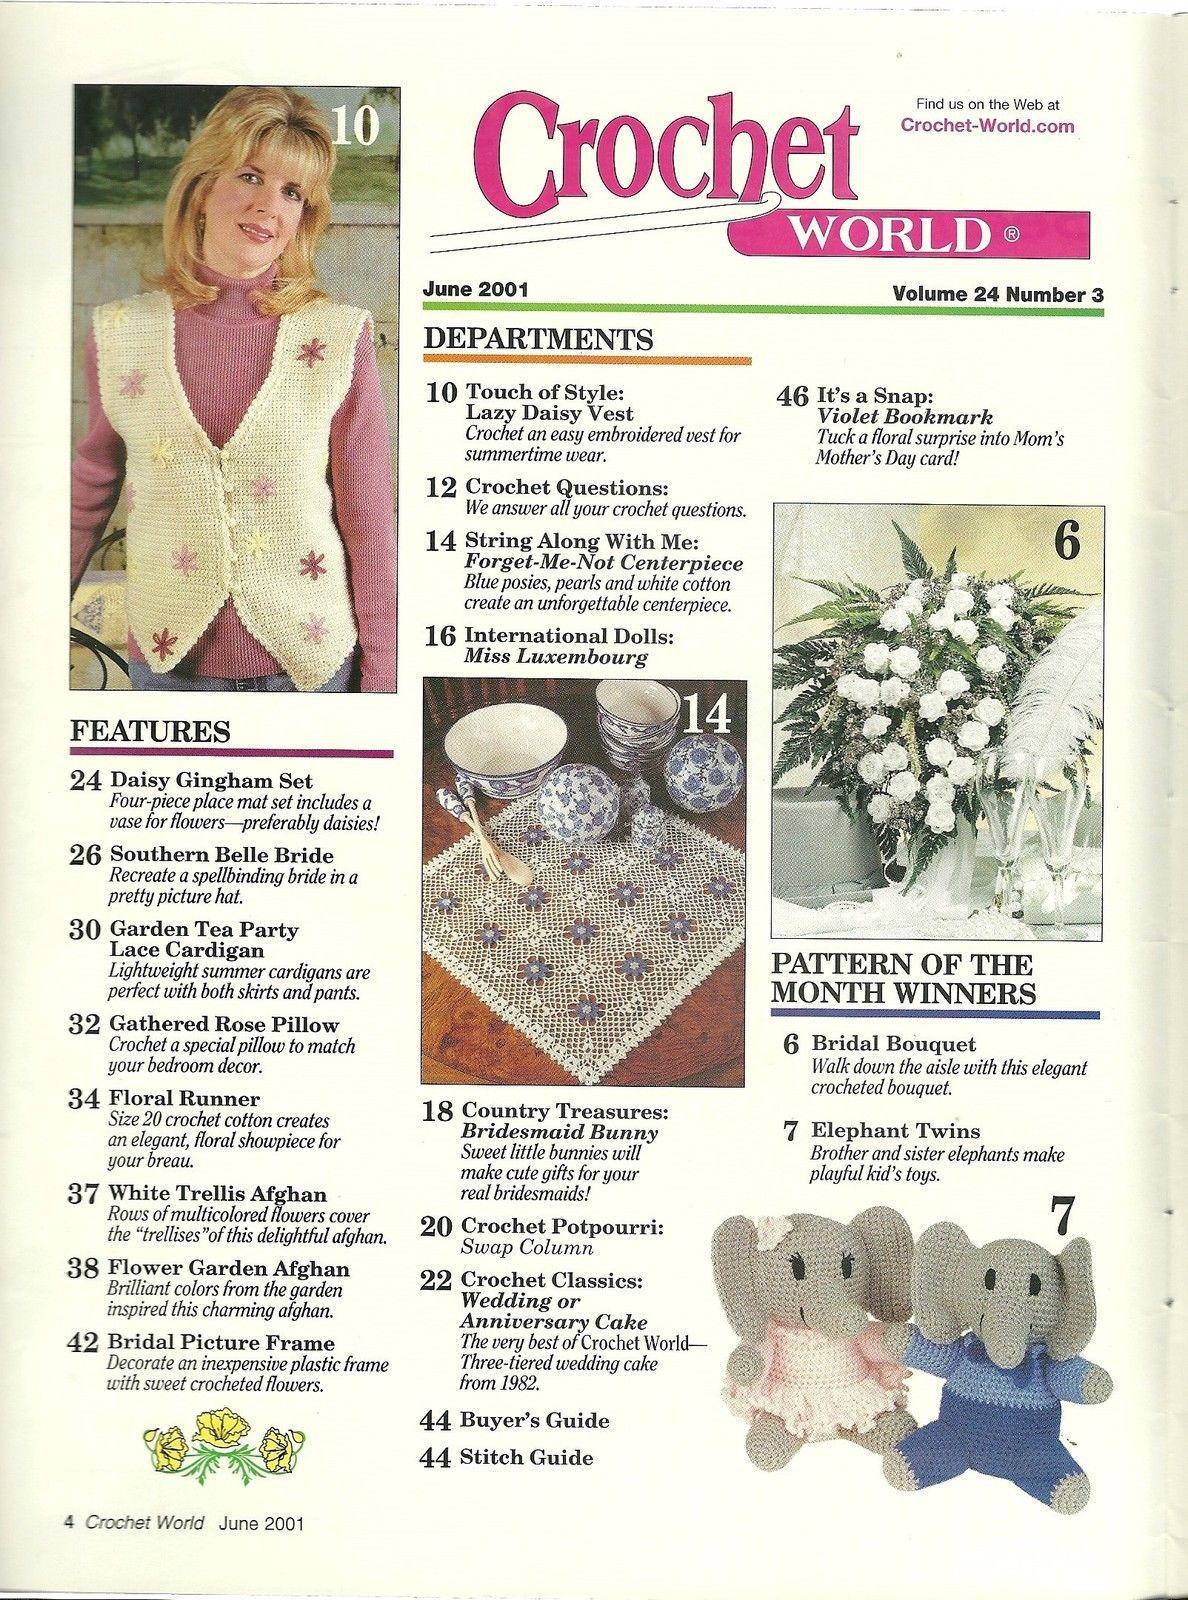 Crochet World Magazine June 2001 Volume 23 No. 3